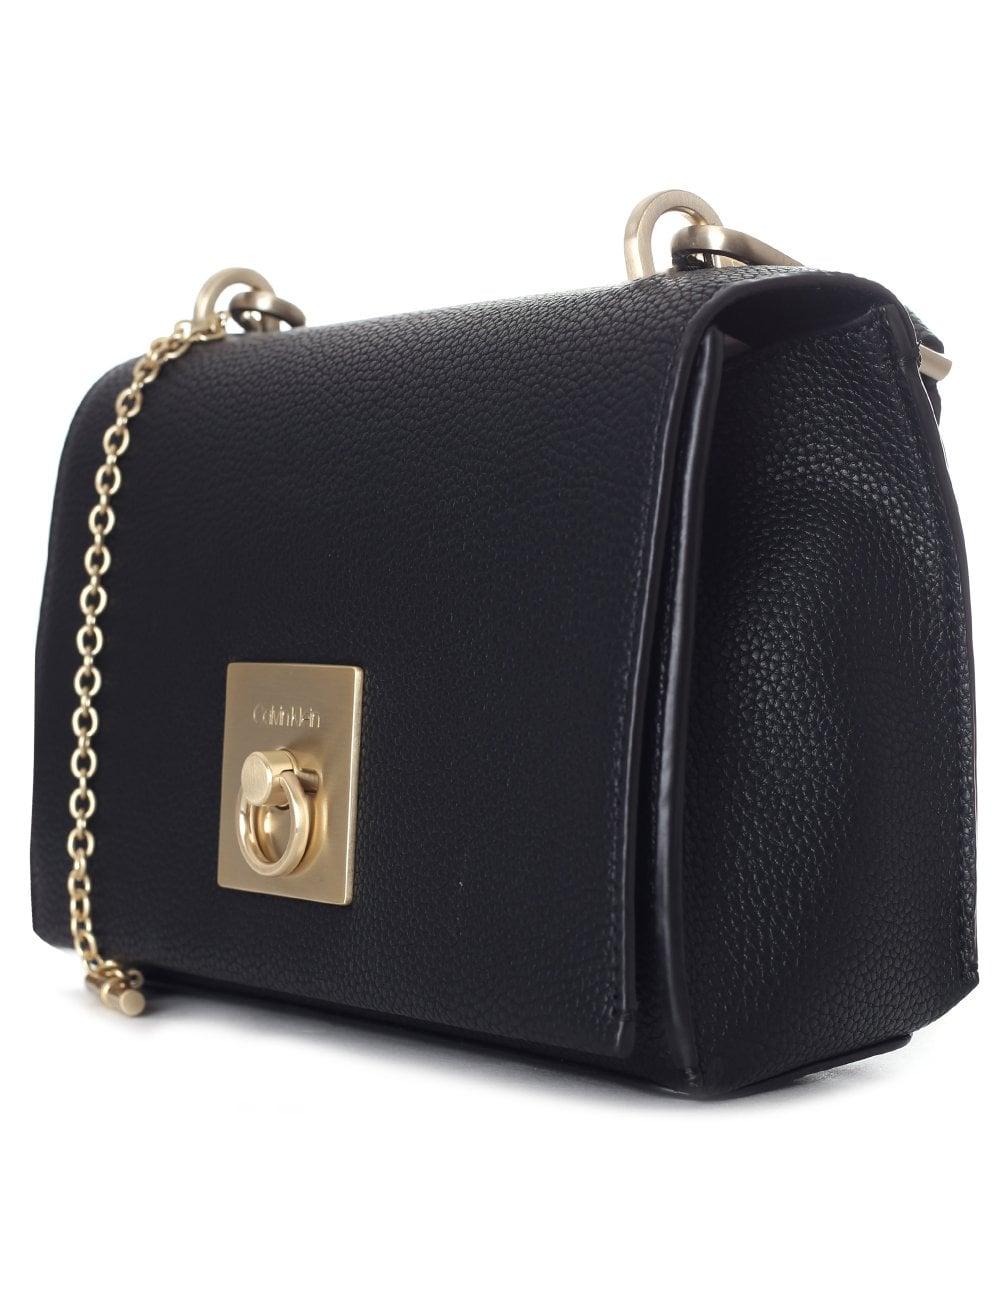 b8d2efa52a1 Clavin Klein Women's CK Lock Medium Flap Crossbody Bag